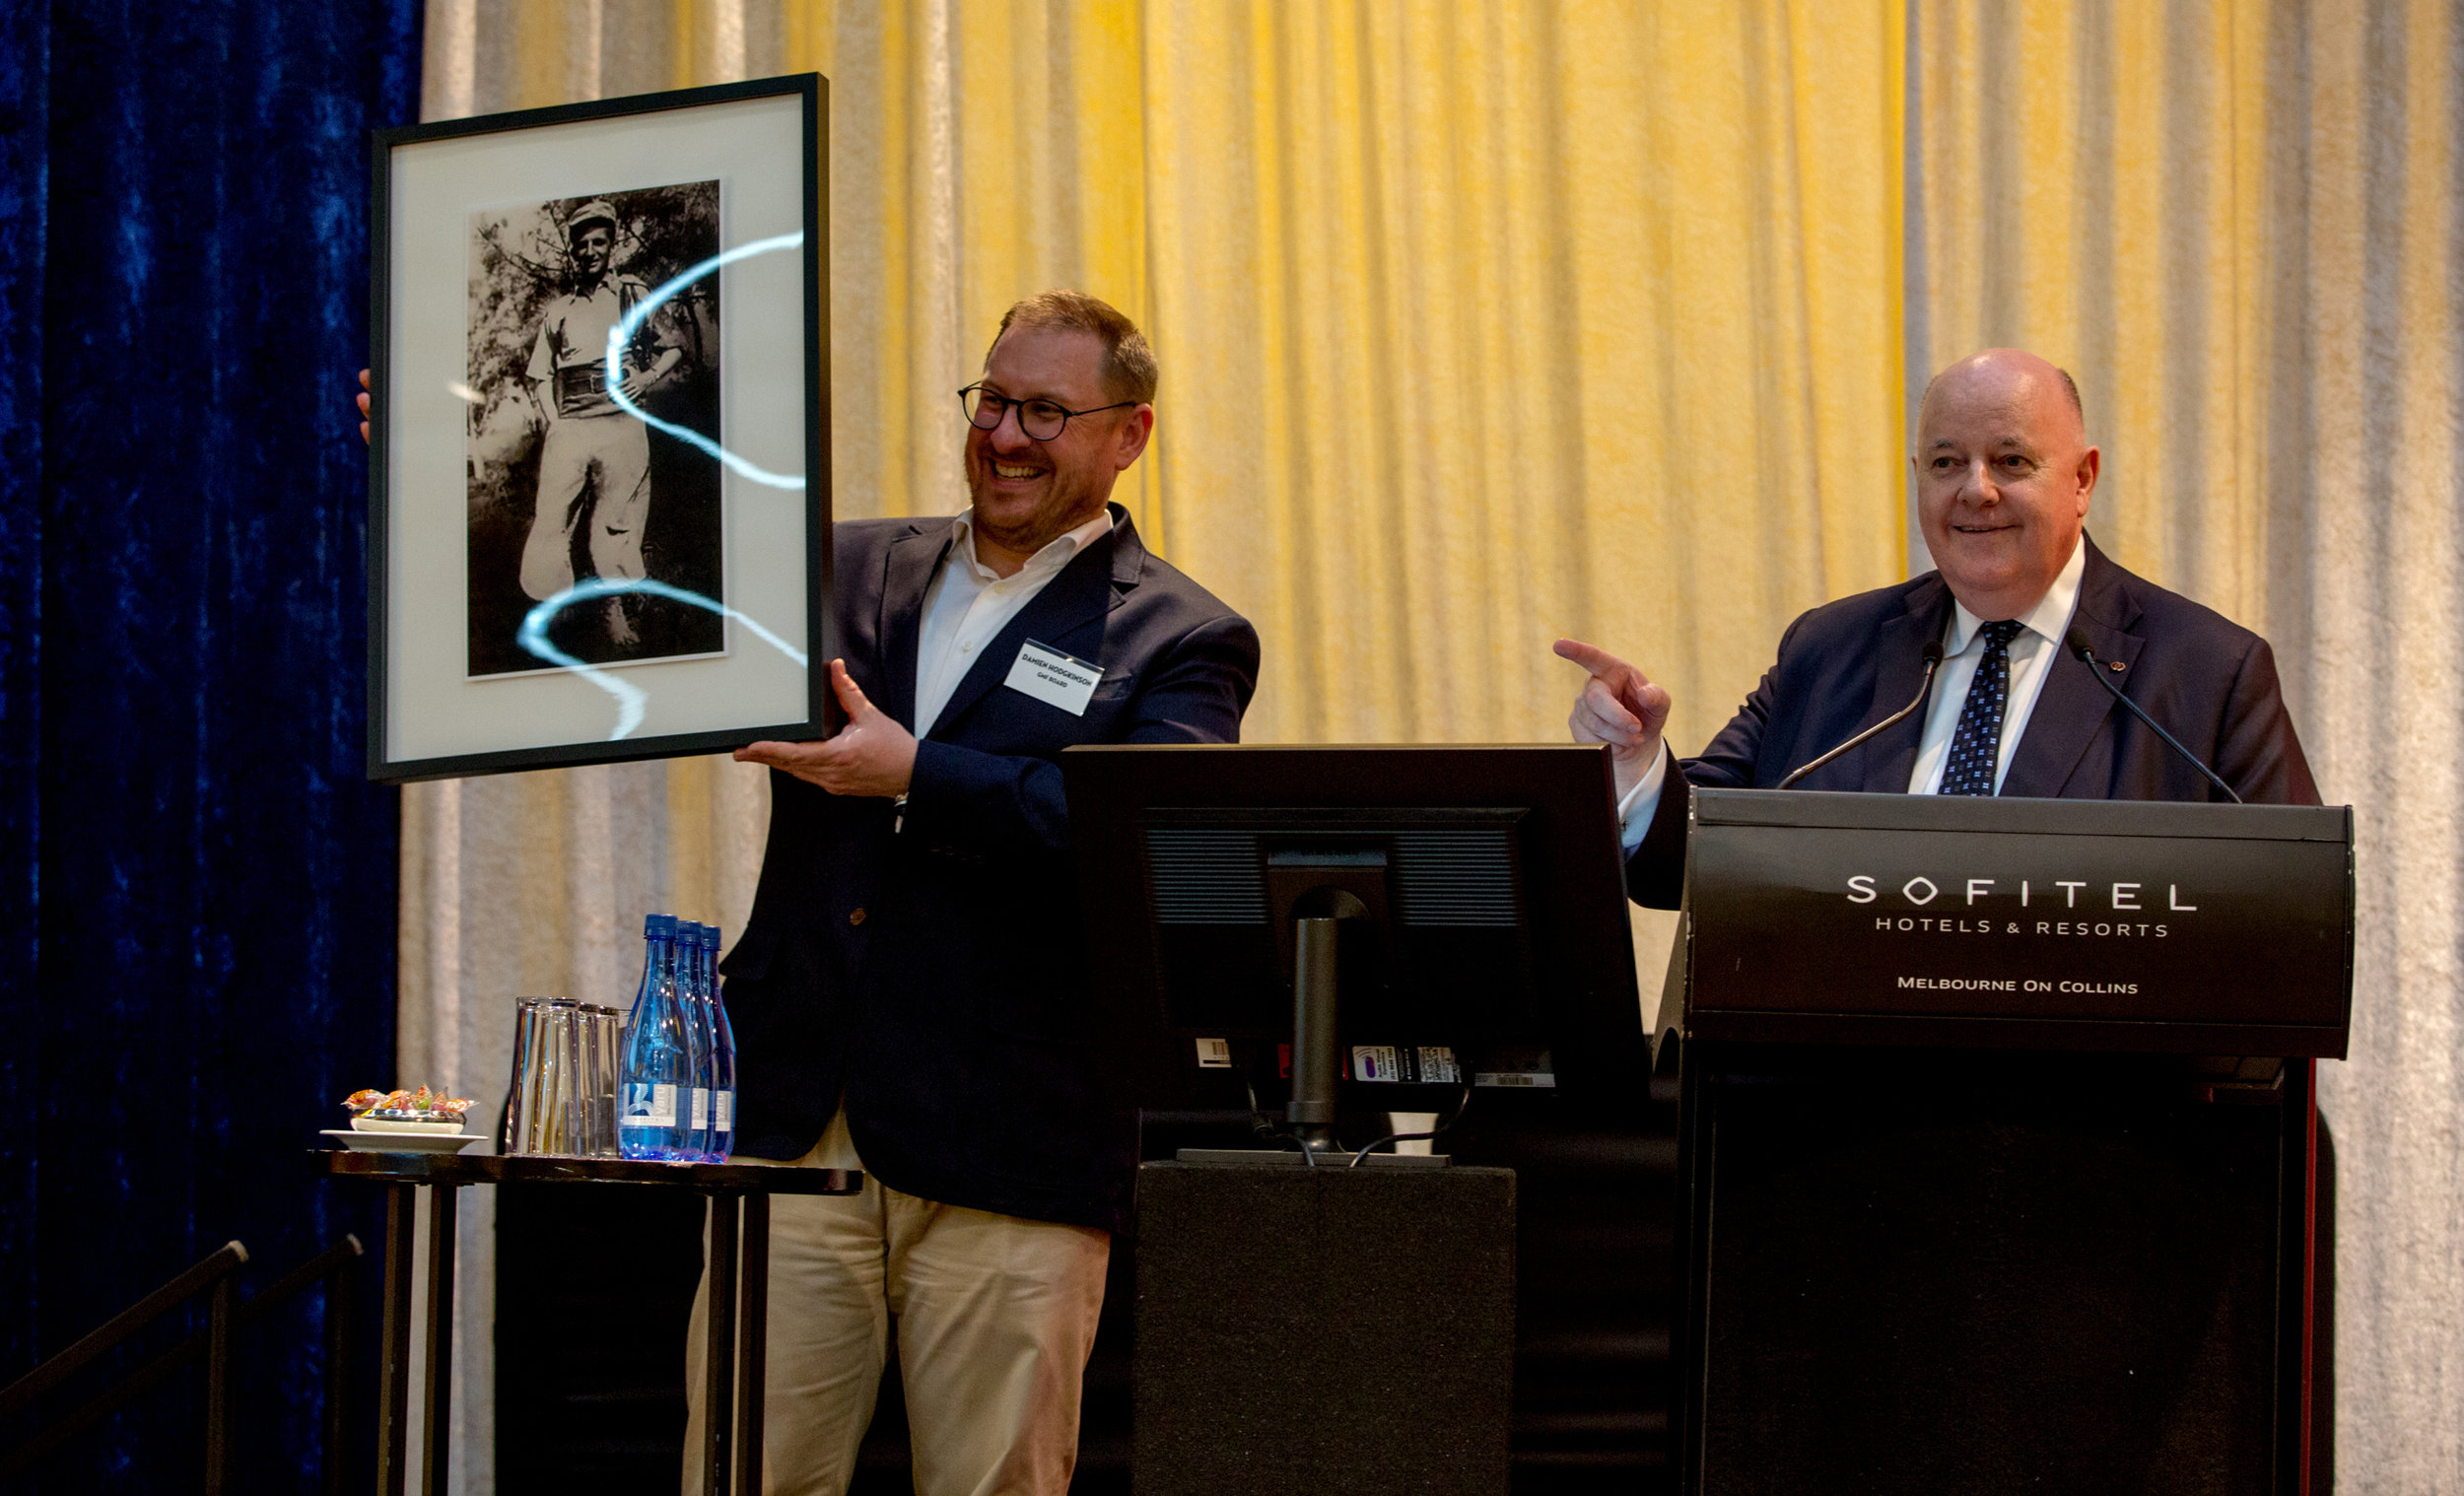 Georges Mora Sofitel Melbourne on Collins